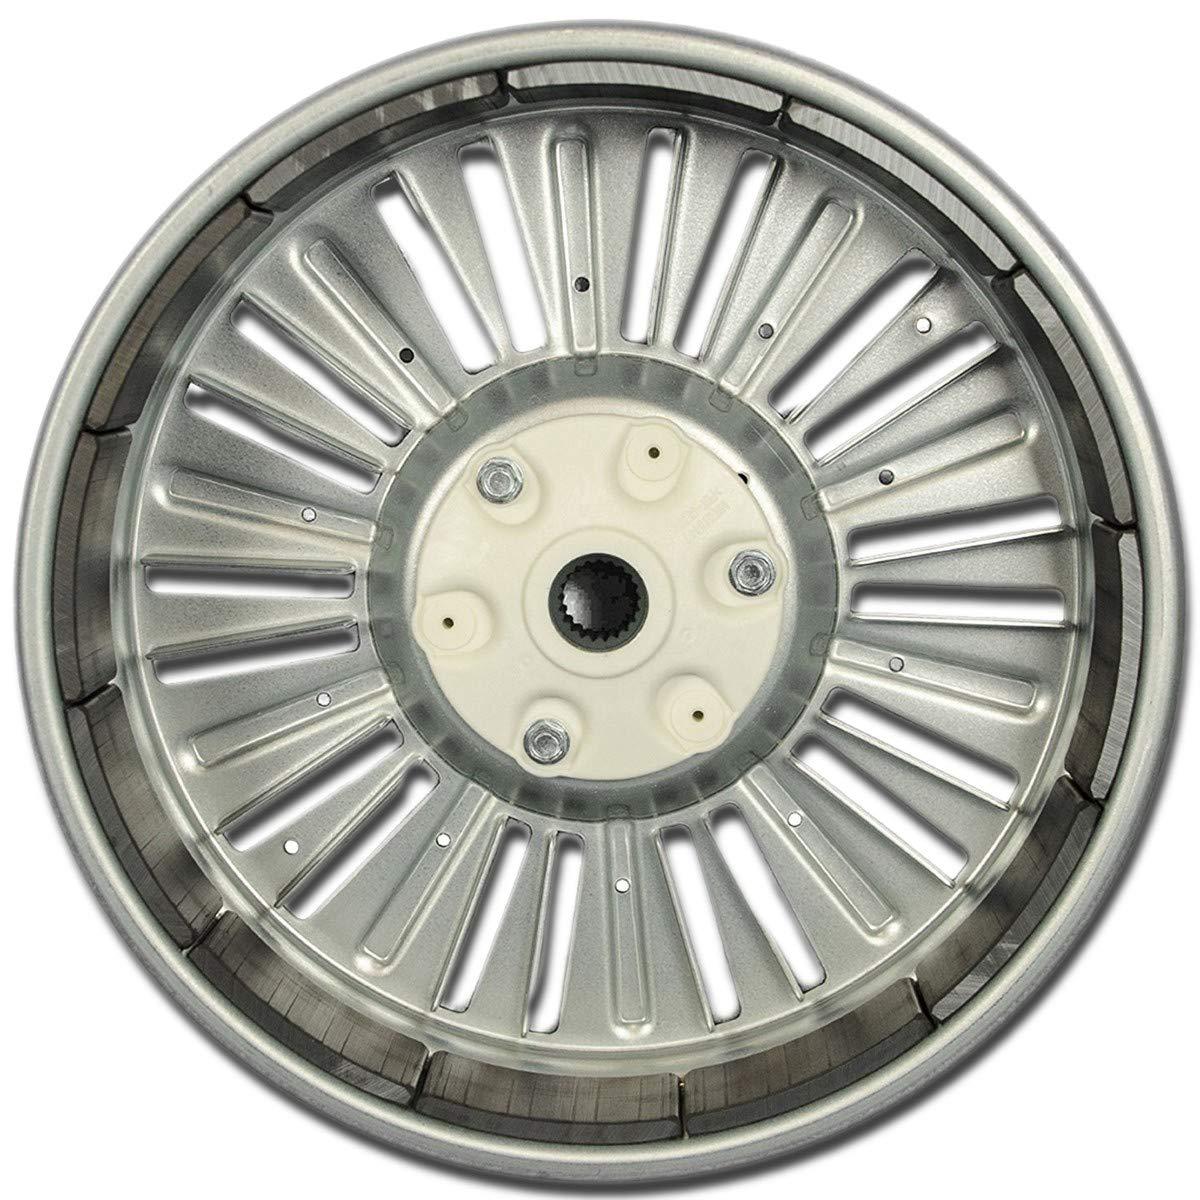 LG 4413ER1003A Rotor Assembly Washing Machine - silver